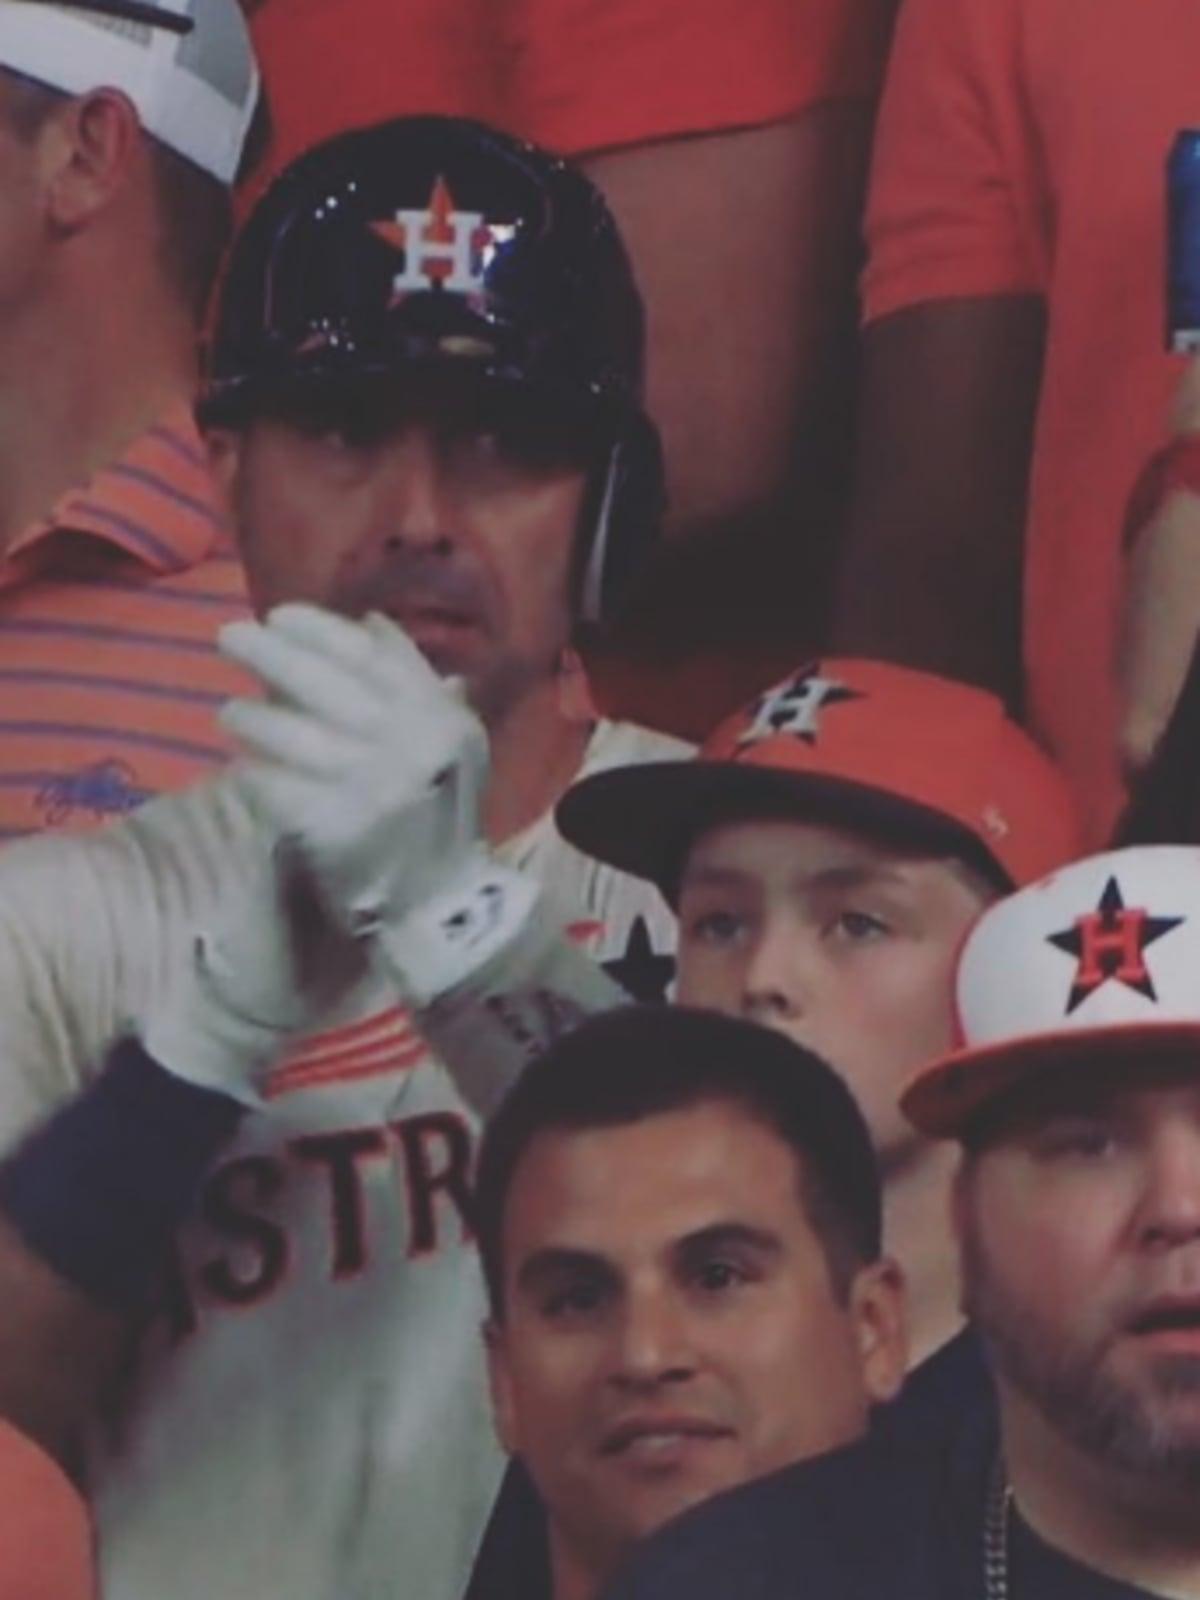 Moustapha El-Hakam in Houston Astros uniform at ALCS game